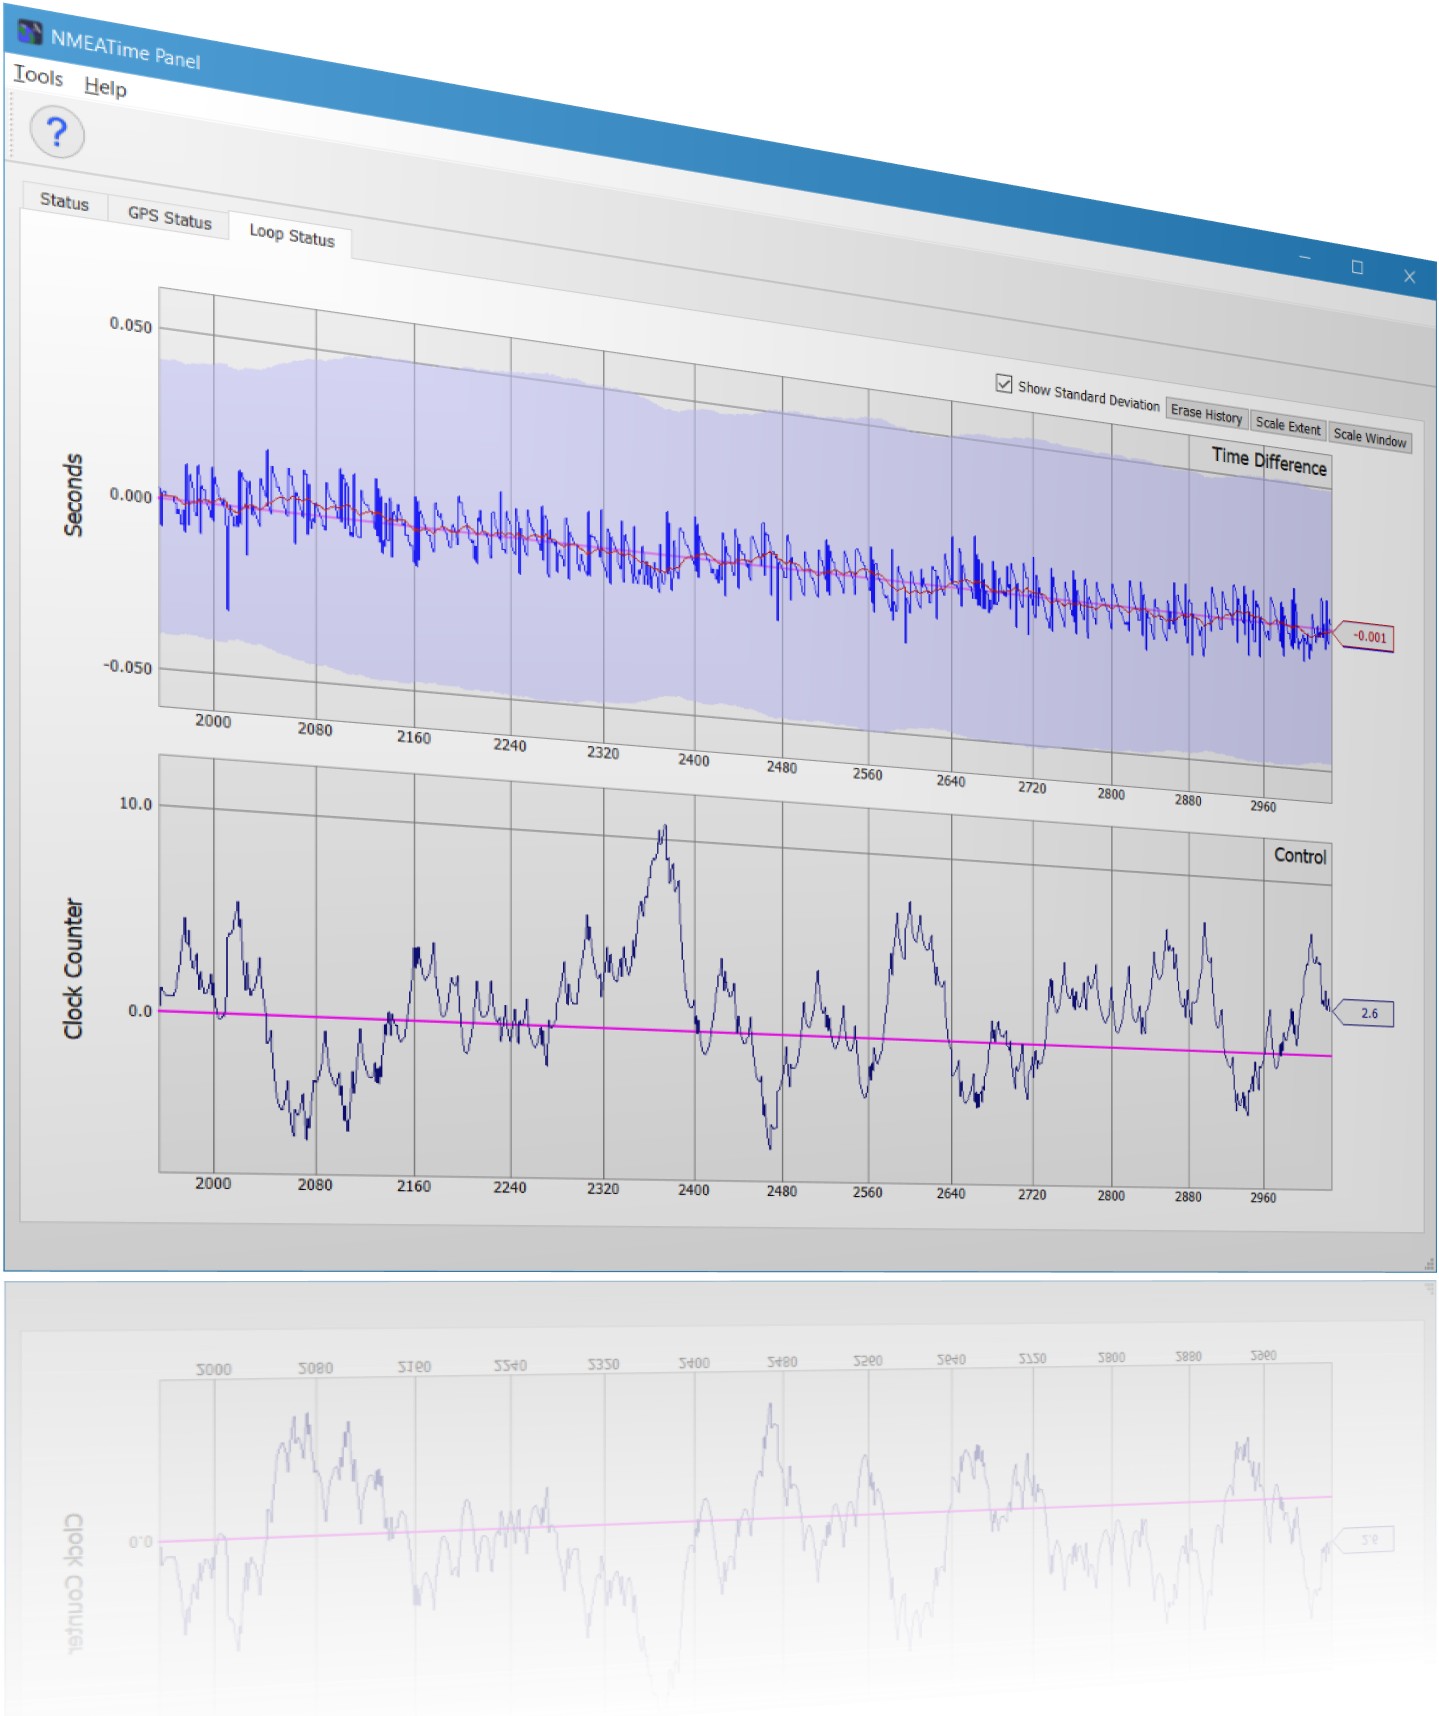 Visualgps Llc Nmea Gps 0183 Wiring Diagram Nmeatime2 Pc Time Synchronization